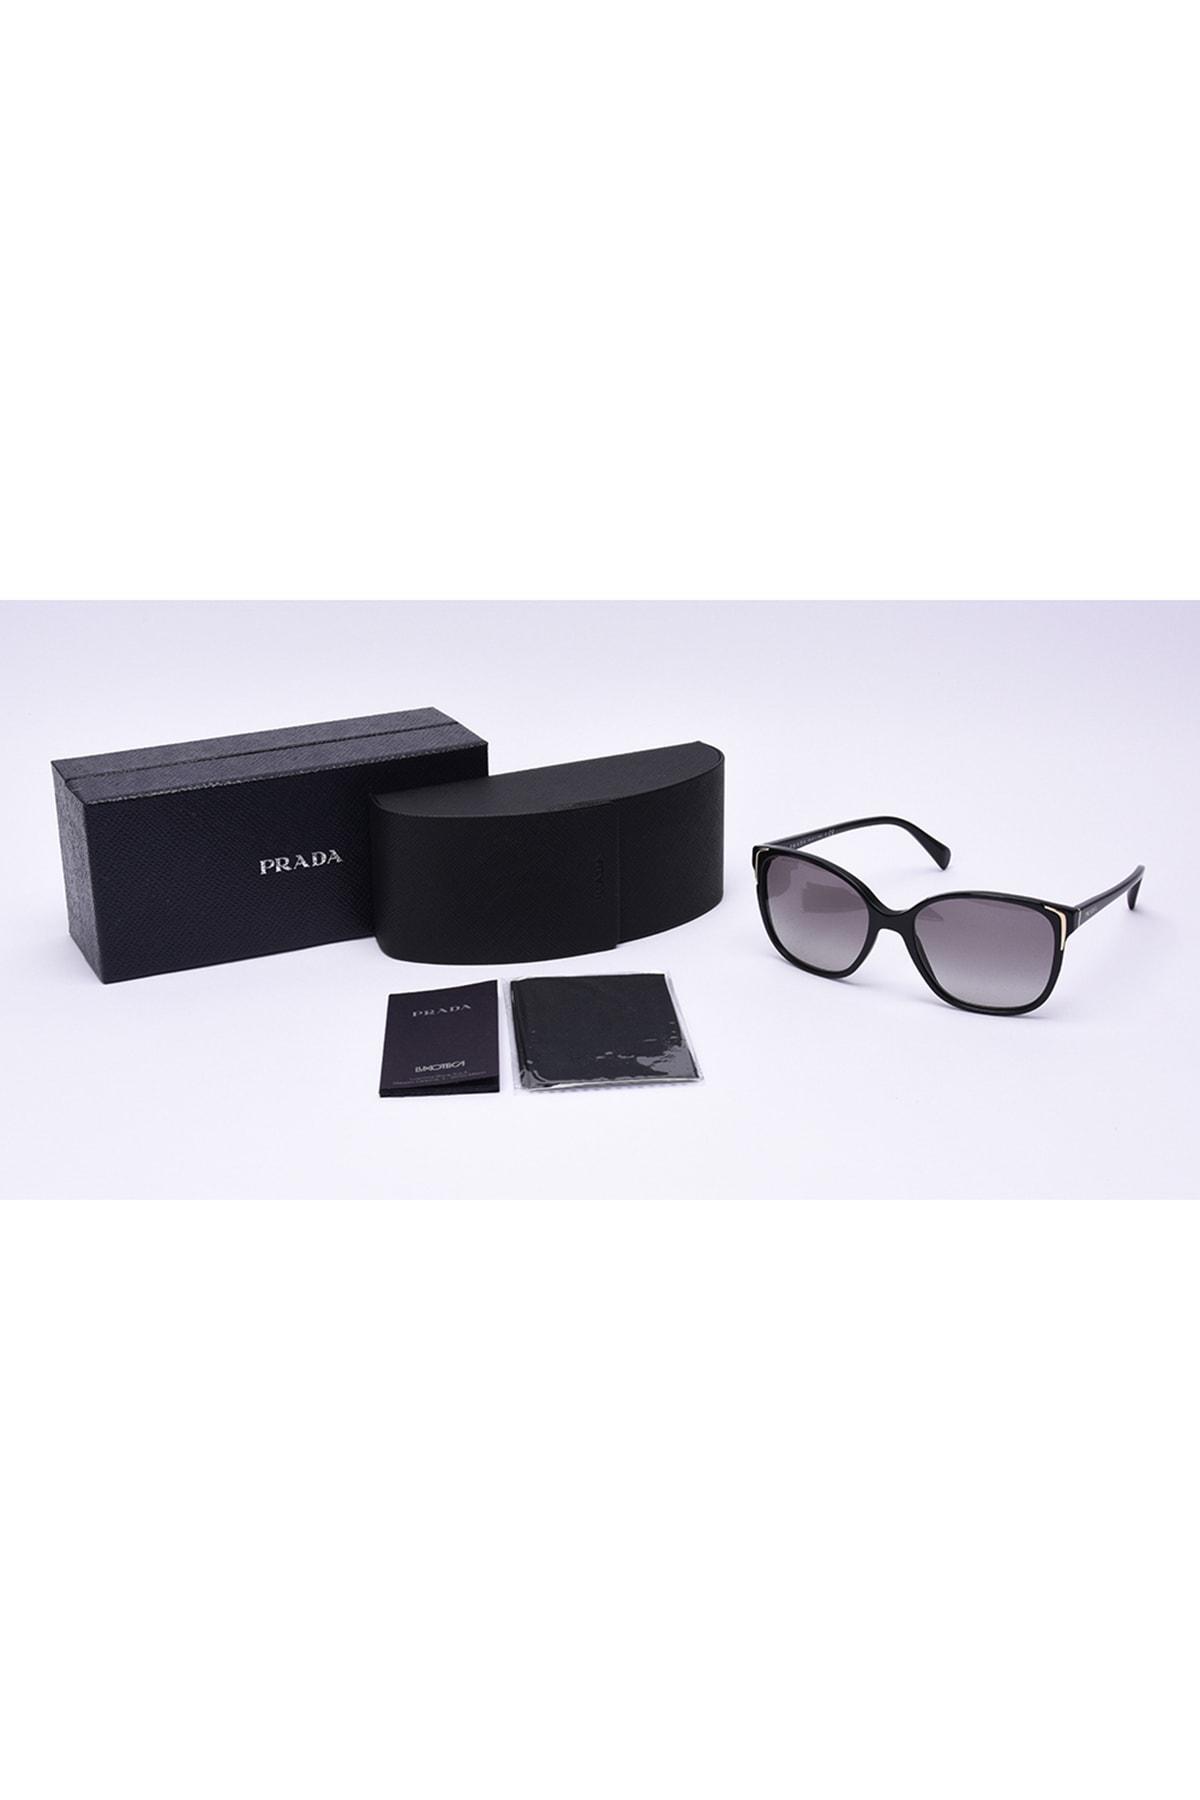 Prada Kadın Güneş Gözlüğü PR01OS1AB3M155-T1 2